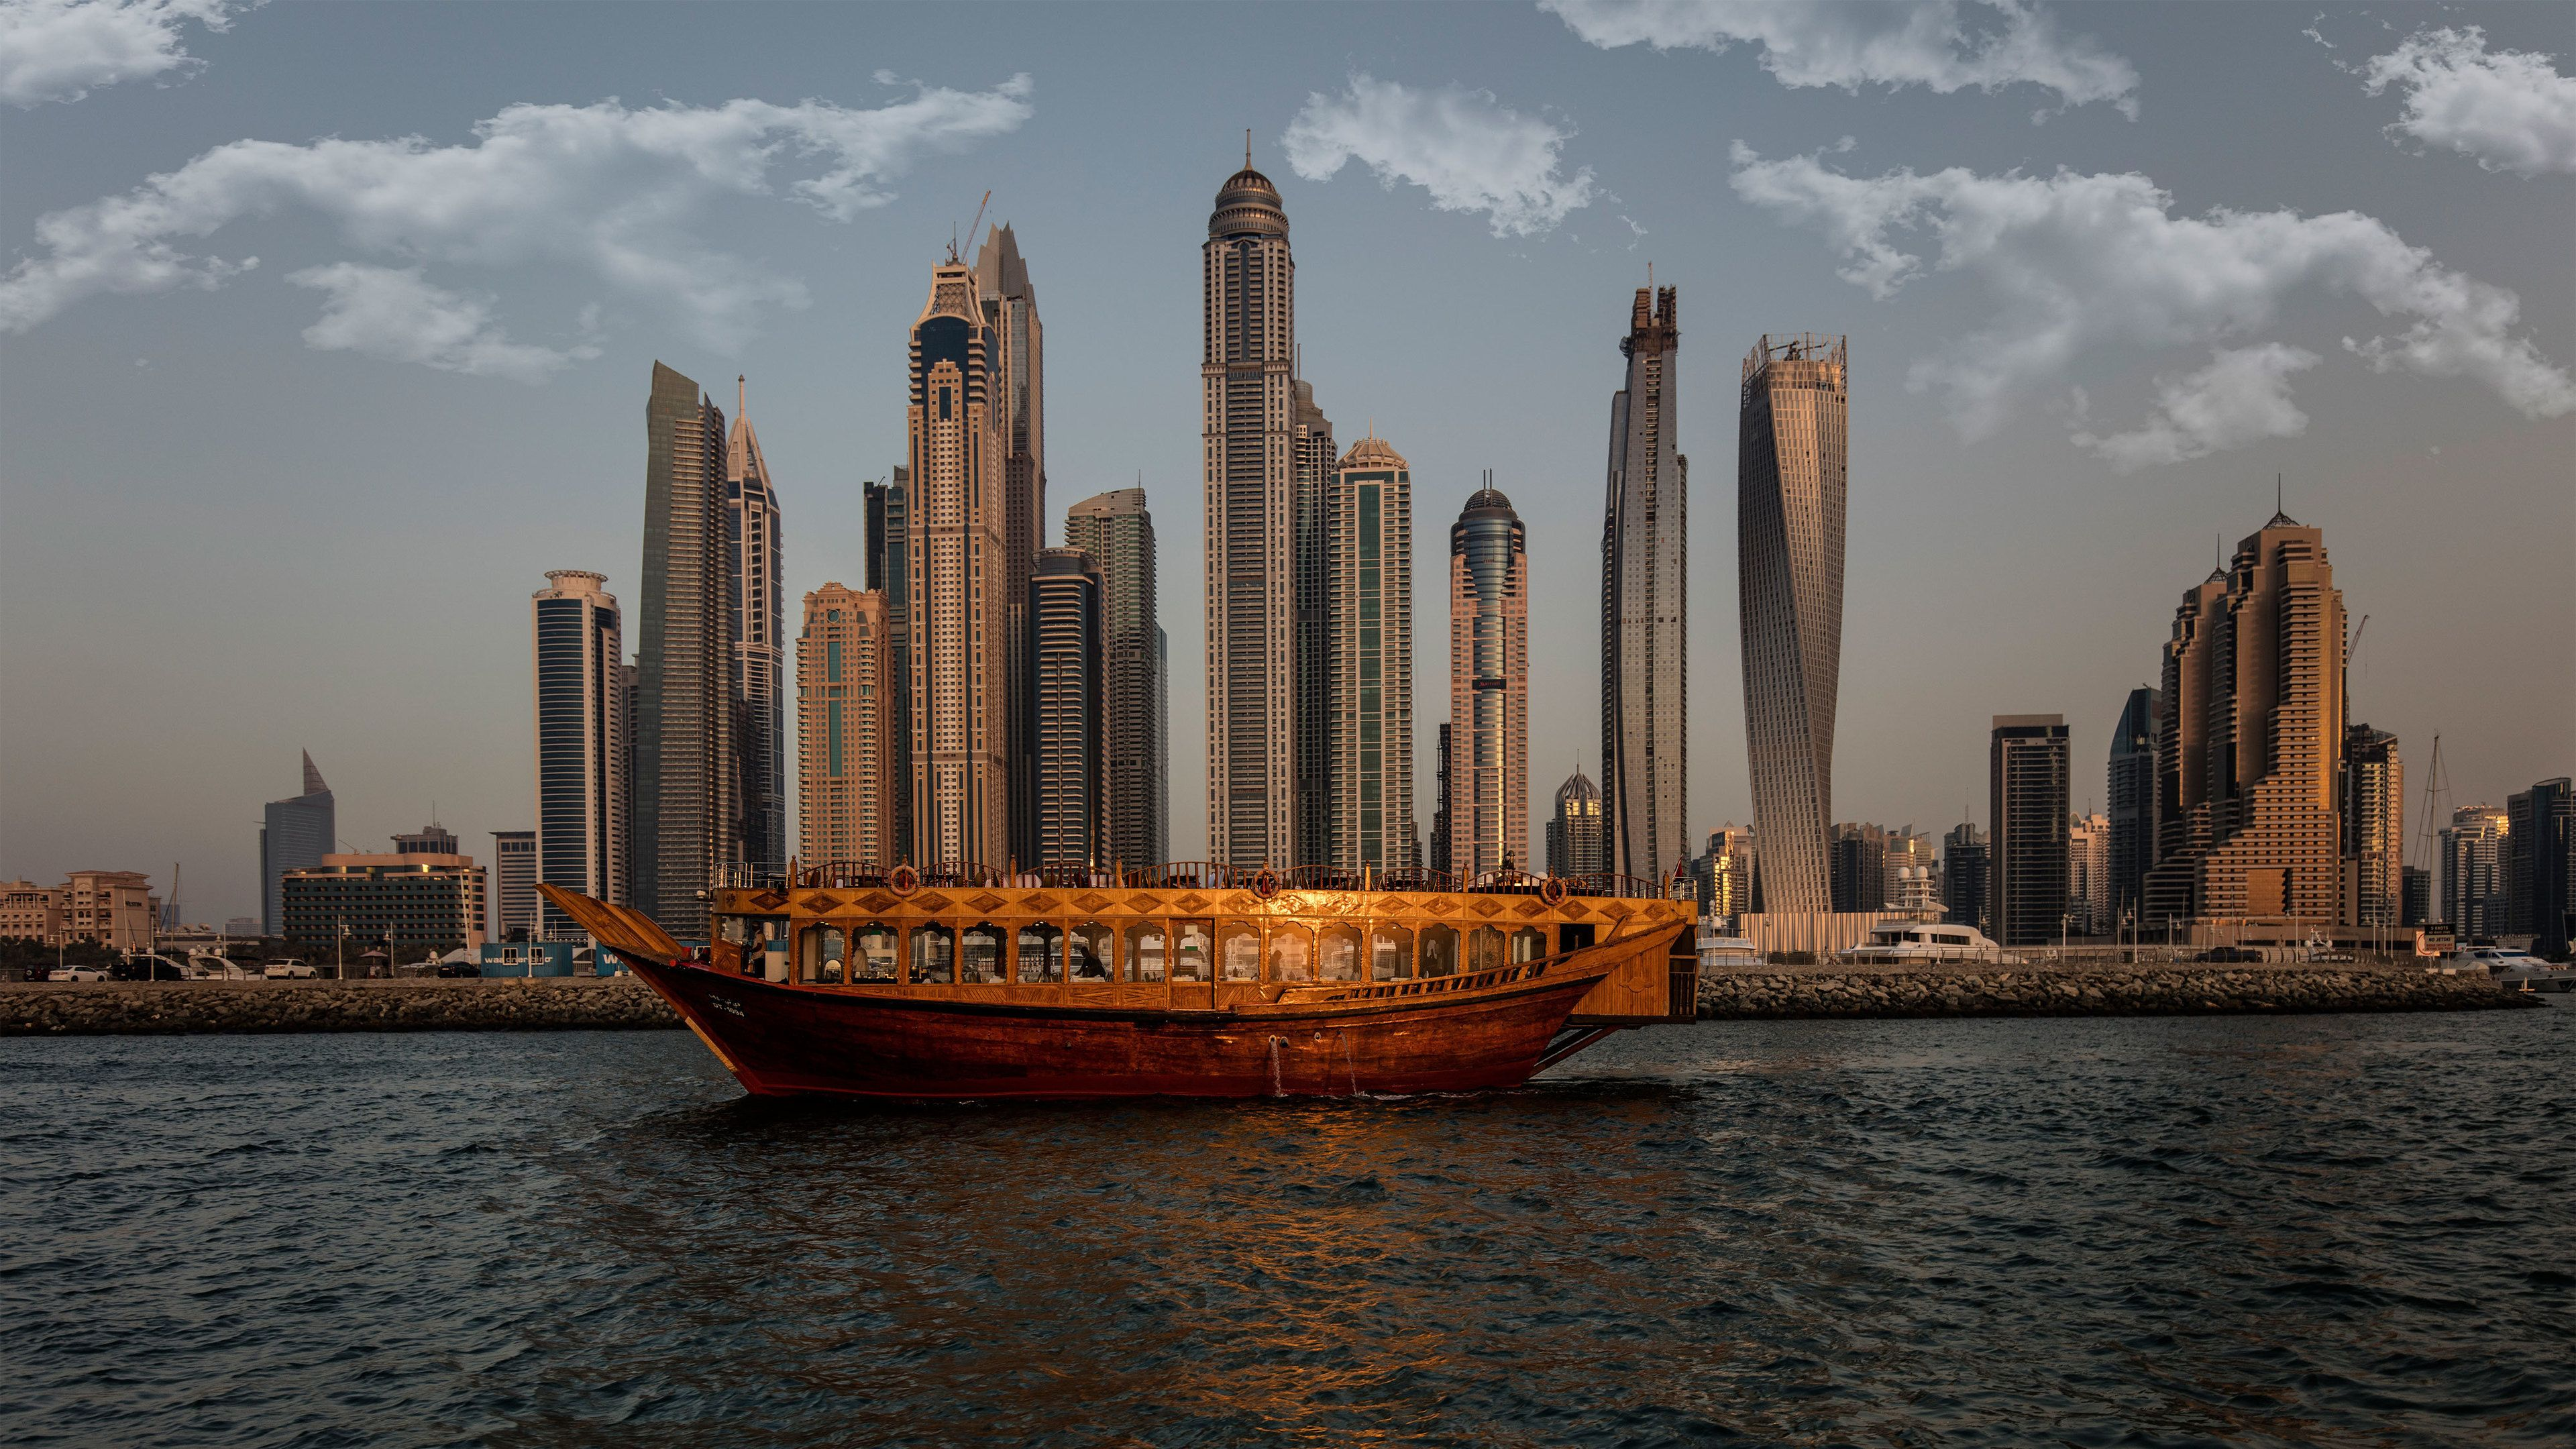 Dubai Marina Cruise with Buffet Dinner